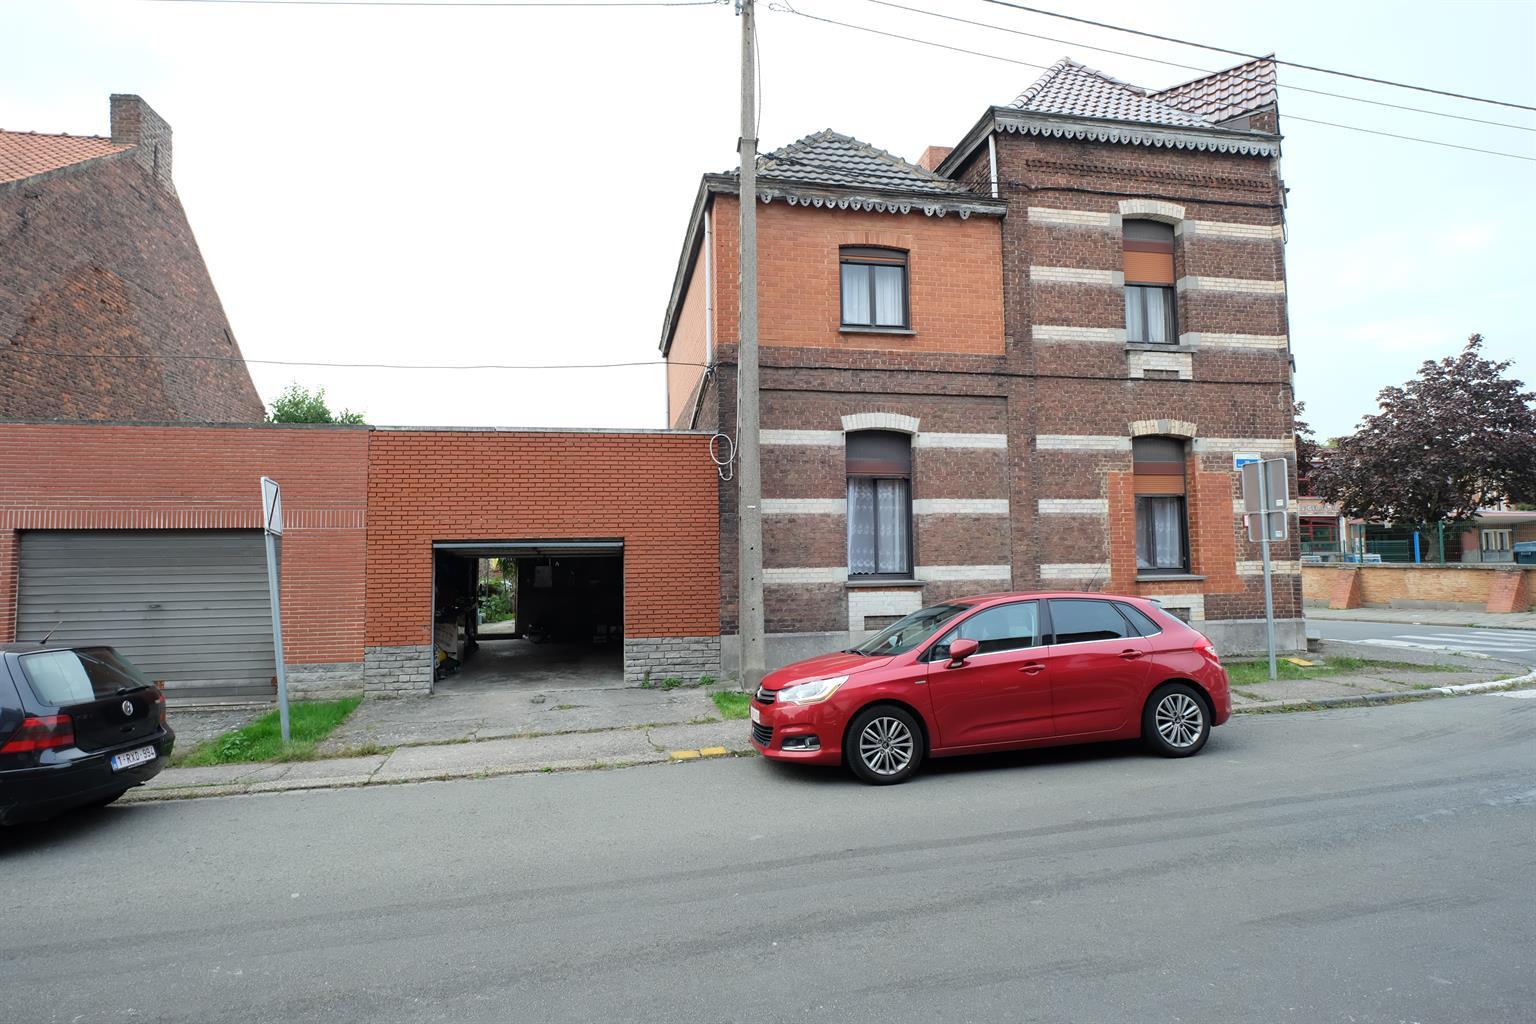 Maison - Colfontaine - #4501144-3